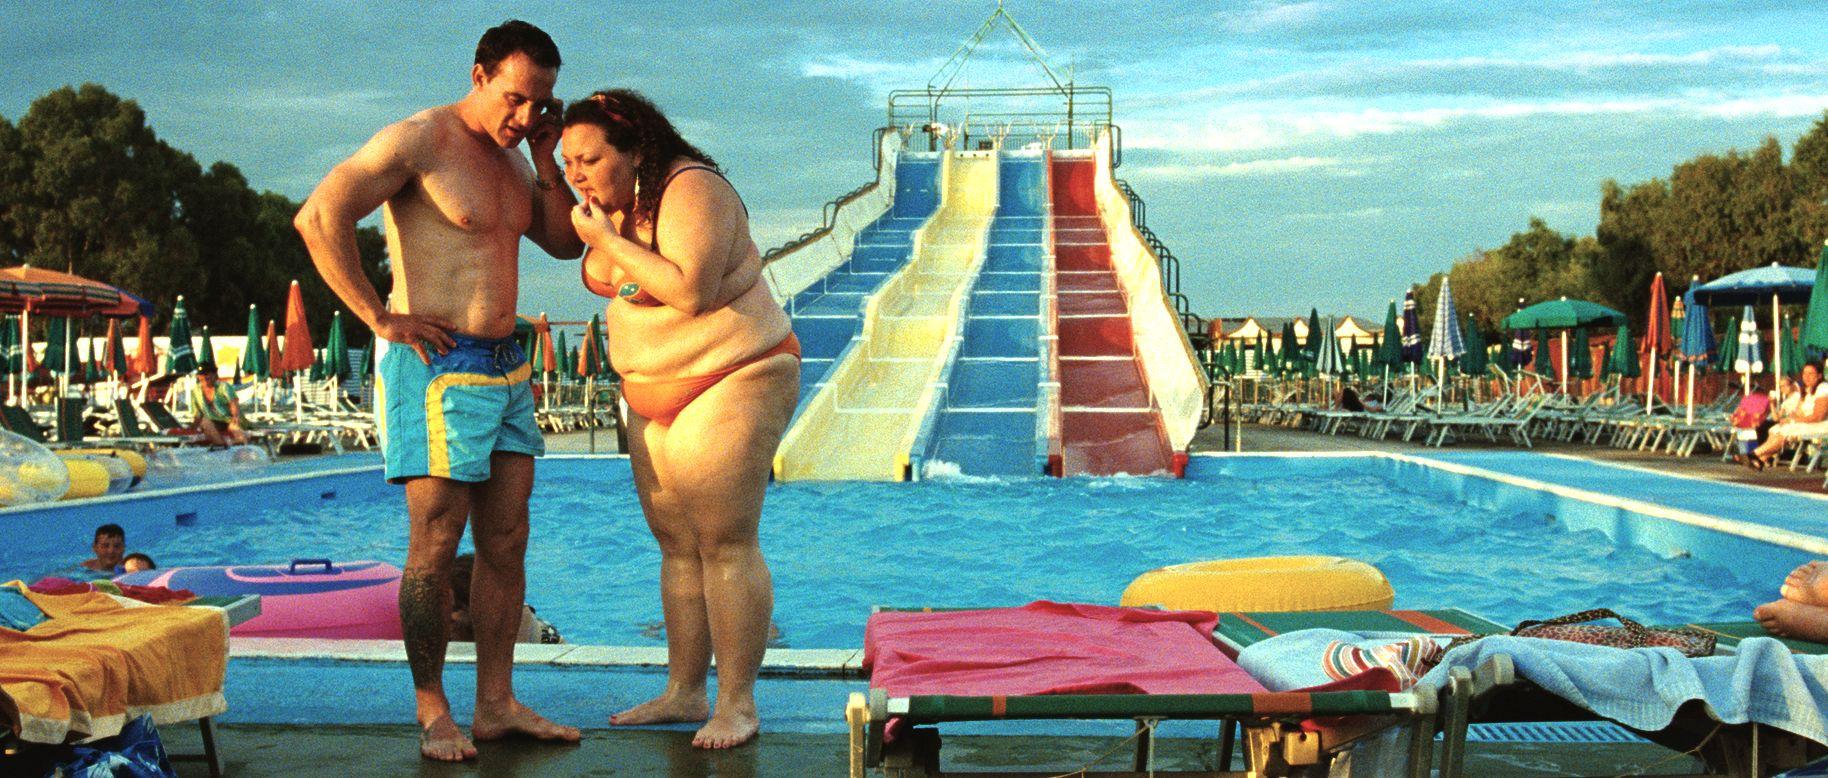 Reality Swimming Pool